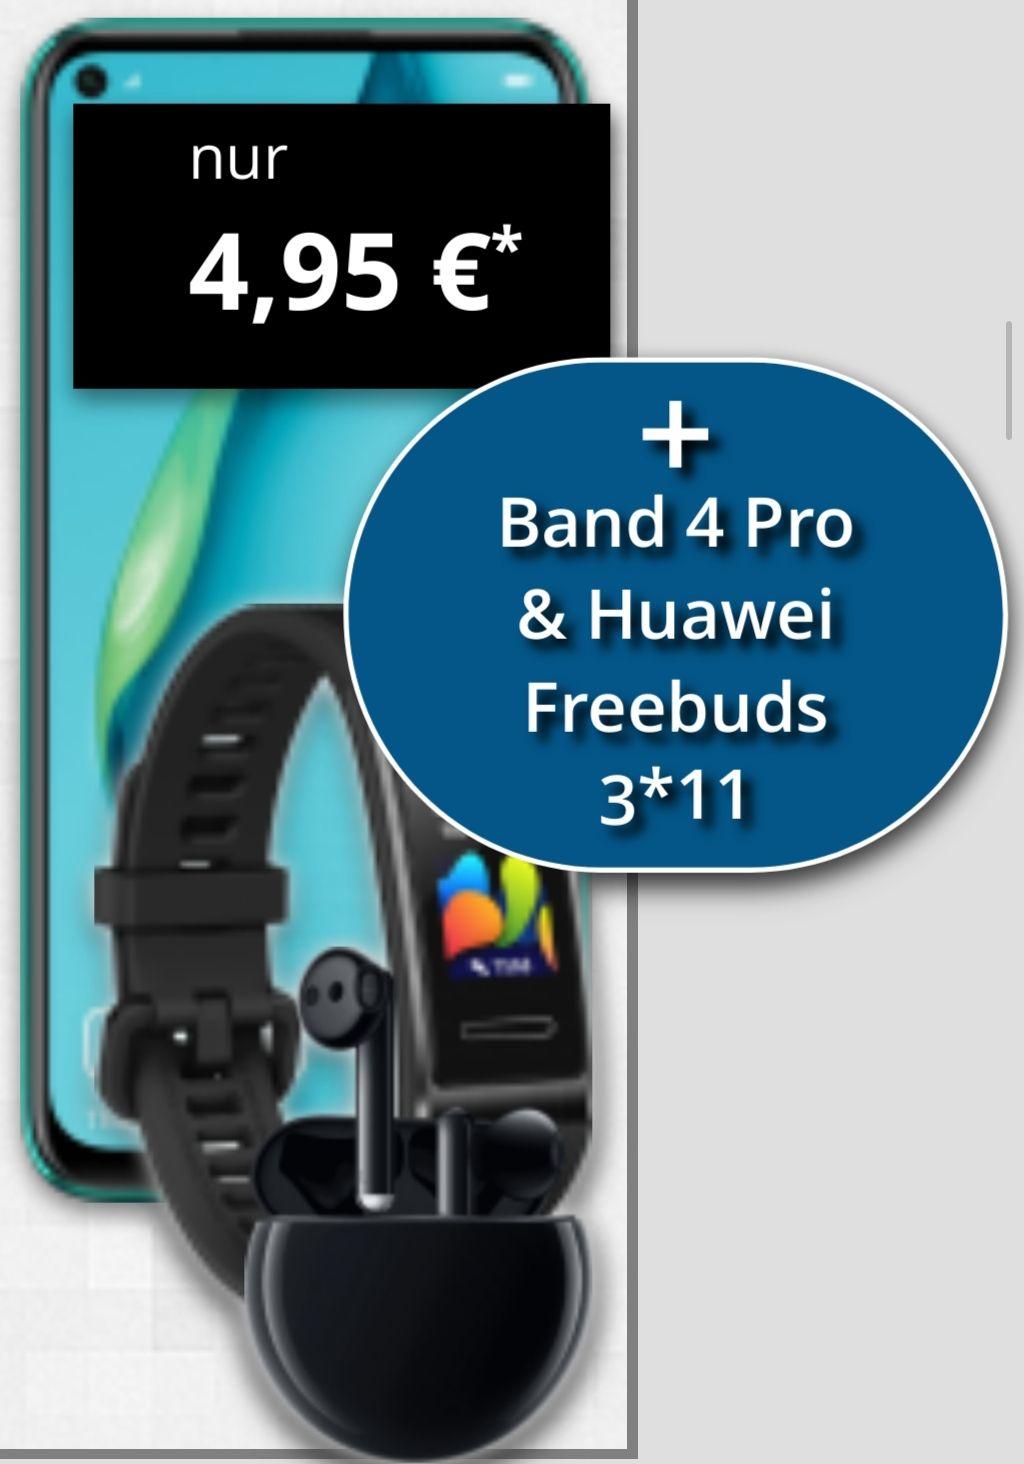 Huawei P40 Lite + Freebuds 3 + Band 4 Pro o. Samsung Gear Fit 2 Pro im Telekom Congstar (10GB LTE, Allnet/SMS) mtl. 25€ einm. 4,95€